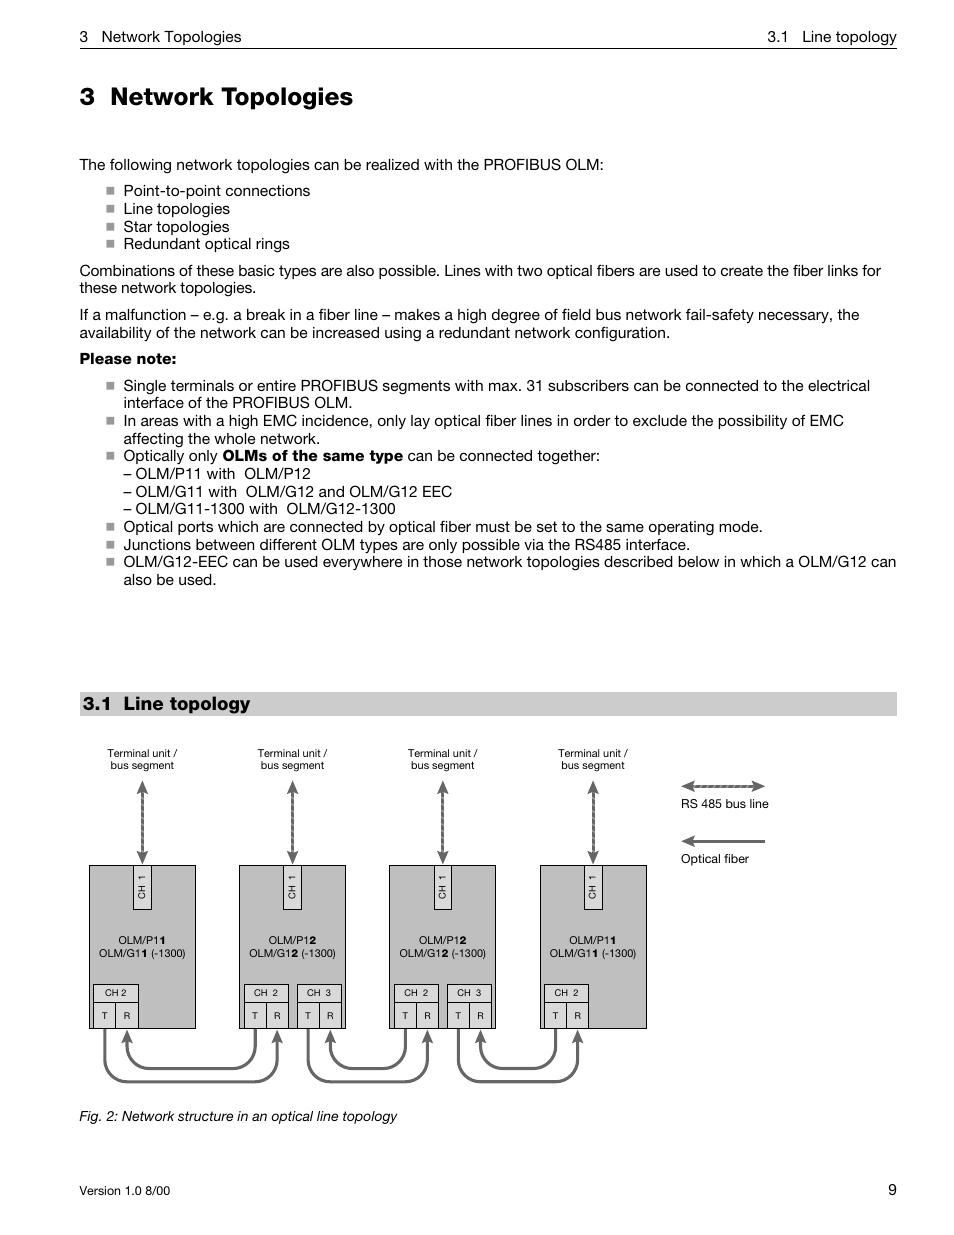 medium resolution of 3 network topologies 1 line topology siemens simatic net profibus user manual page 405 490